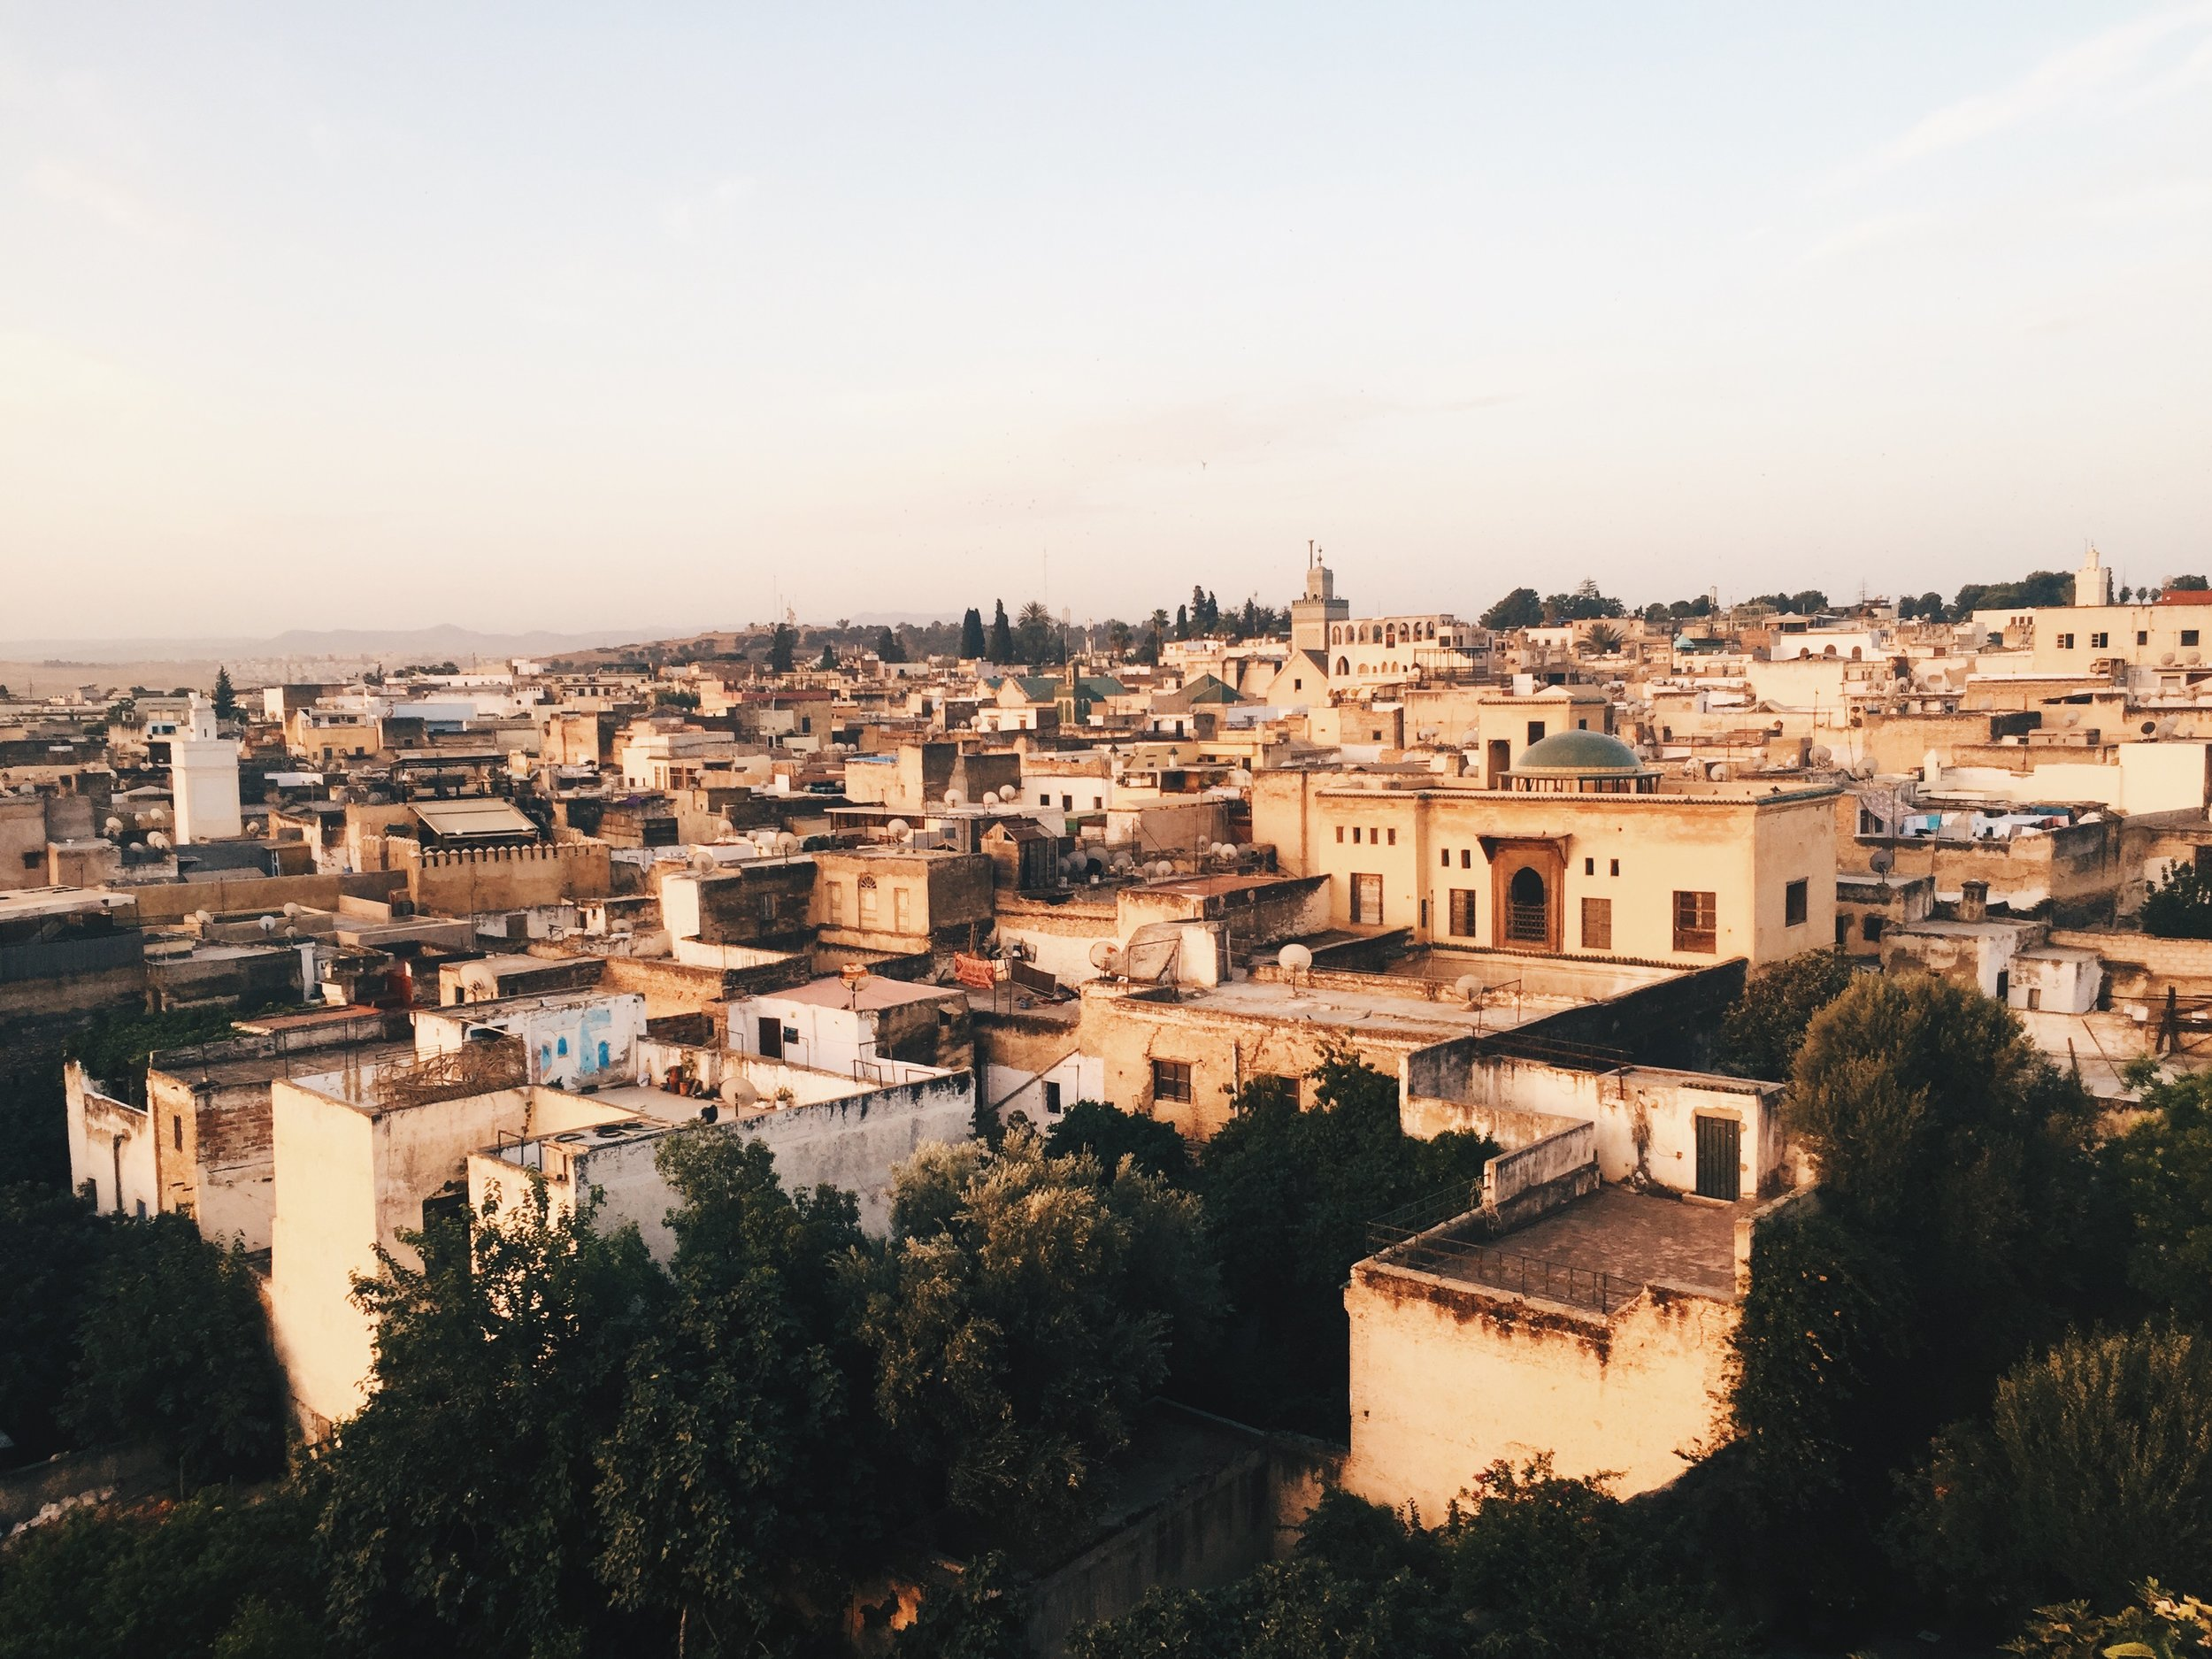 Sunrise in Fes, Morocco